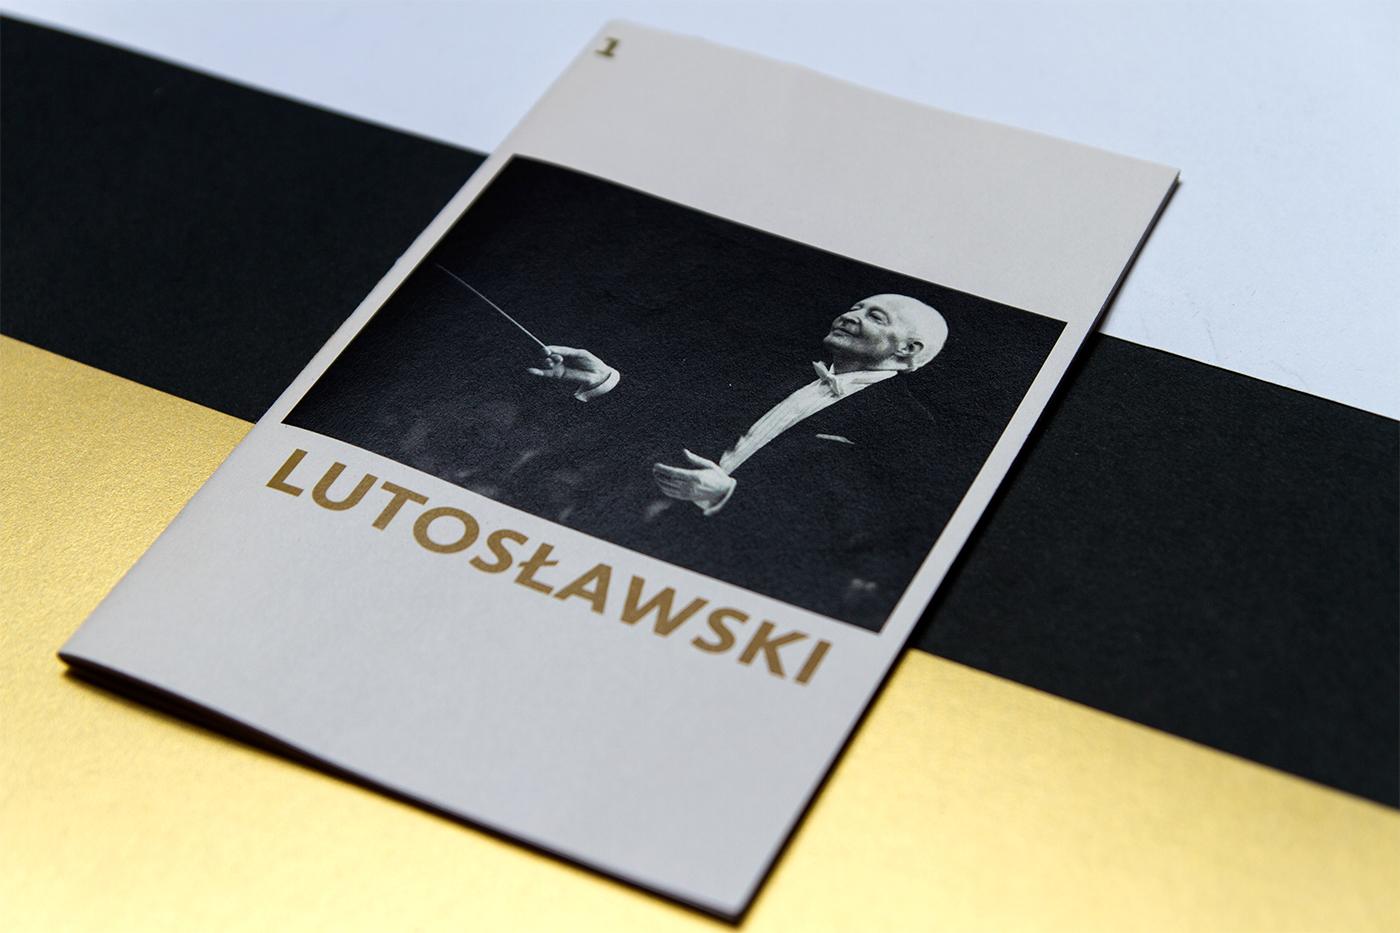 Lutosławski typo mehr gold kompozytor aleatoryzm musician Classic conductor muzyk book black